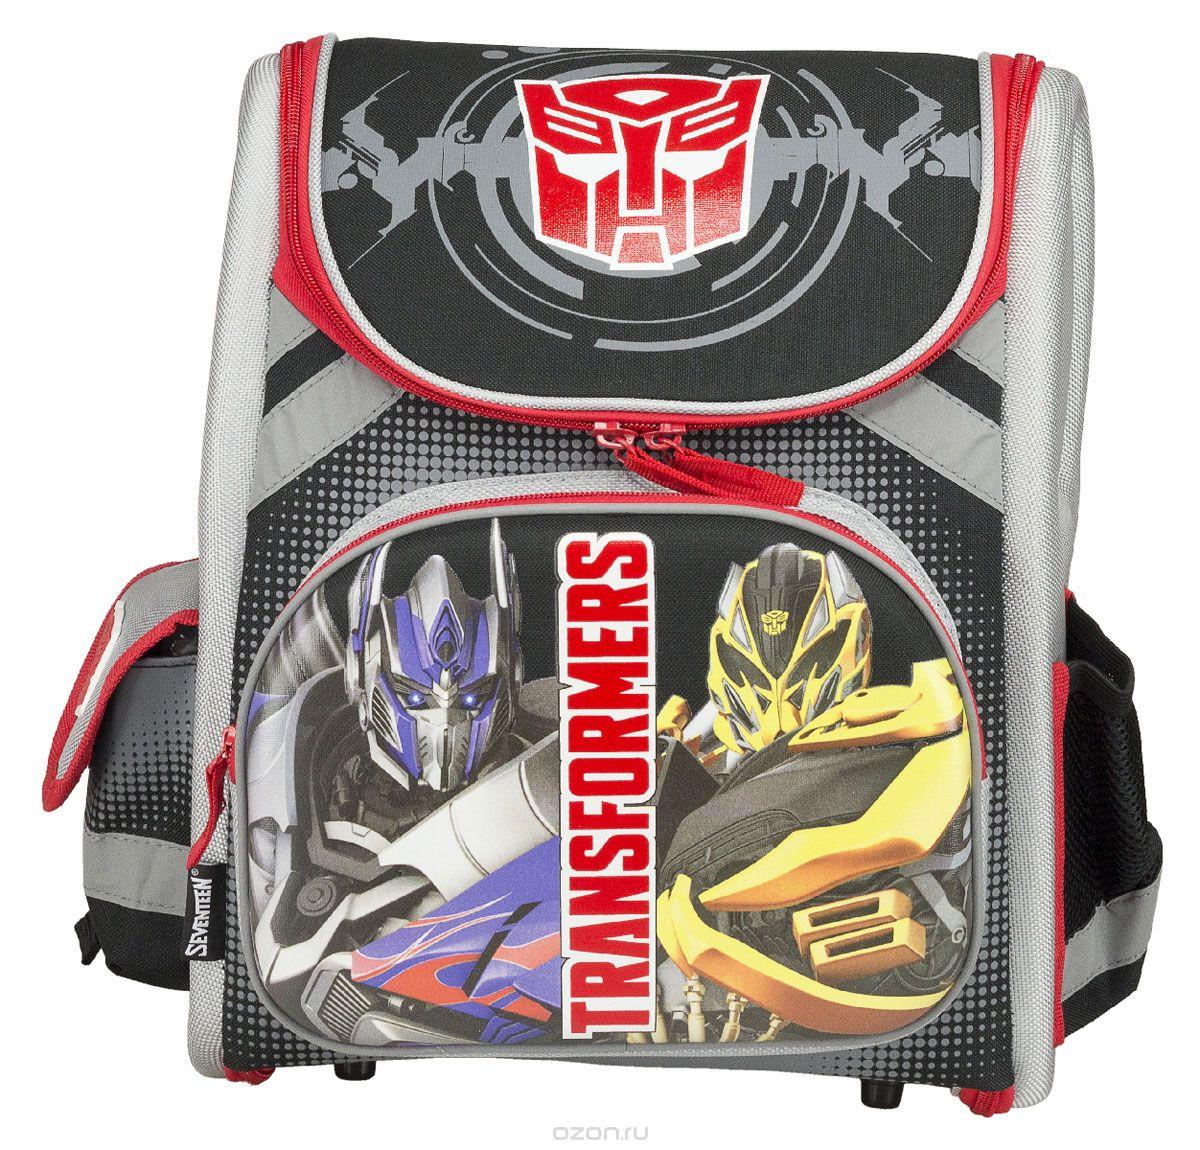 Ранец профилактический с EVA-спинкой Transformers Prime Размер 35 х 31 х 14 см transformers маска bumblebee c1331